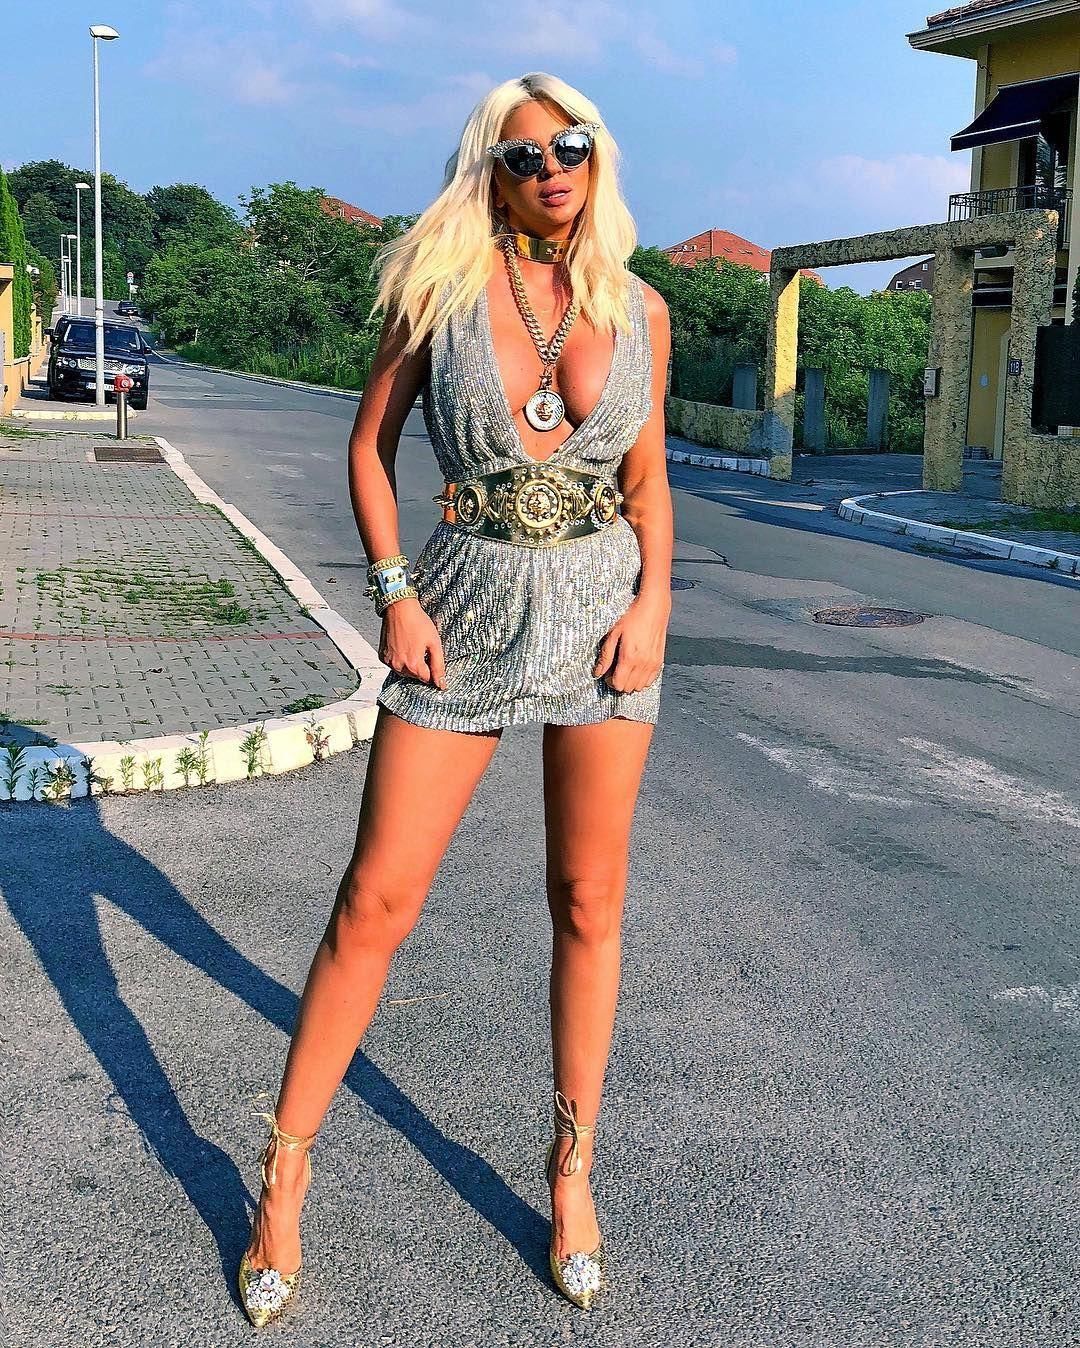 Karleusa Jelena | Jelena karleuša, Fashion, Insta fashion